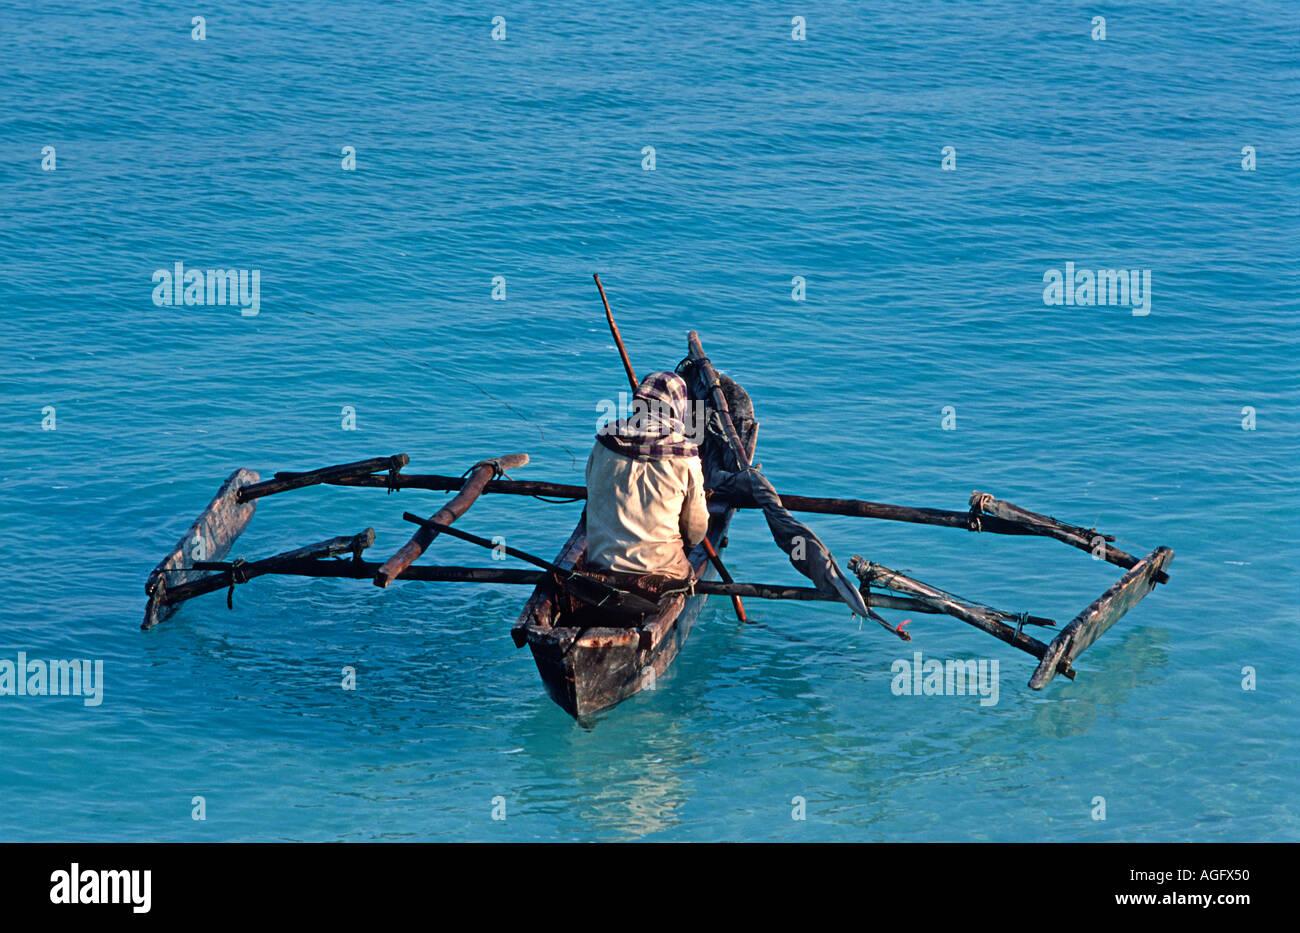 Fisherman in his dugout outrigger canoe Nungwi Unguja Zanzibar Tanzania East Africa - Stock Image